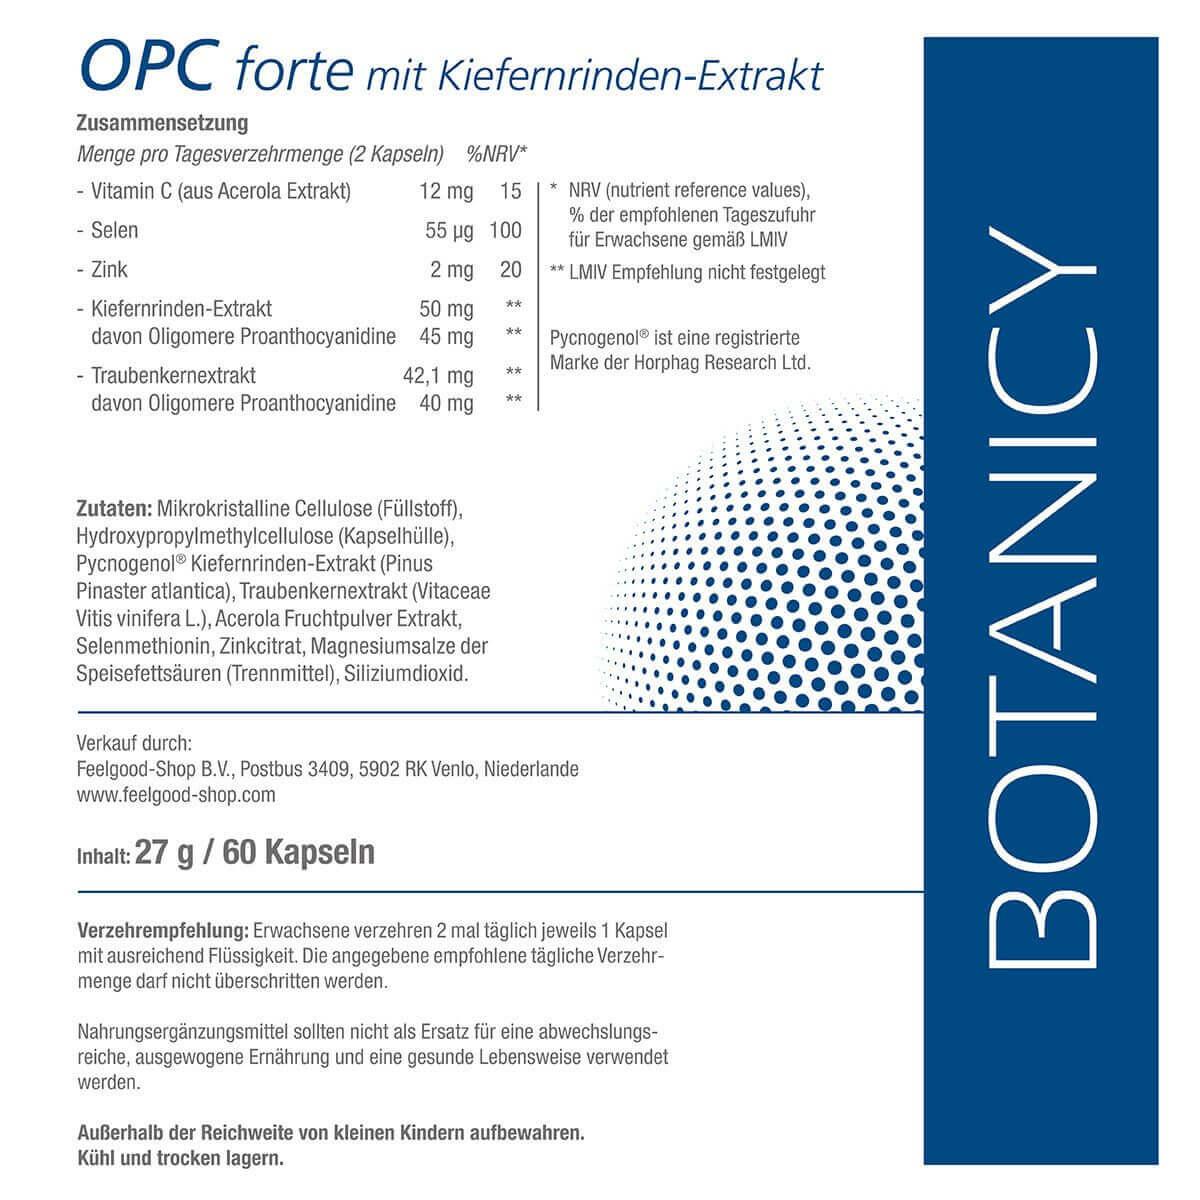 OPC forte mit Pycnogenol